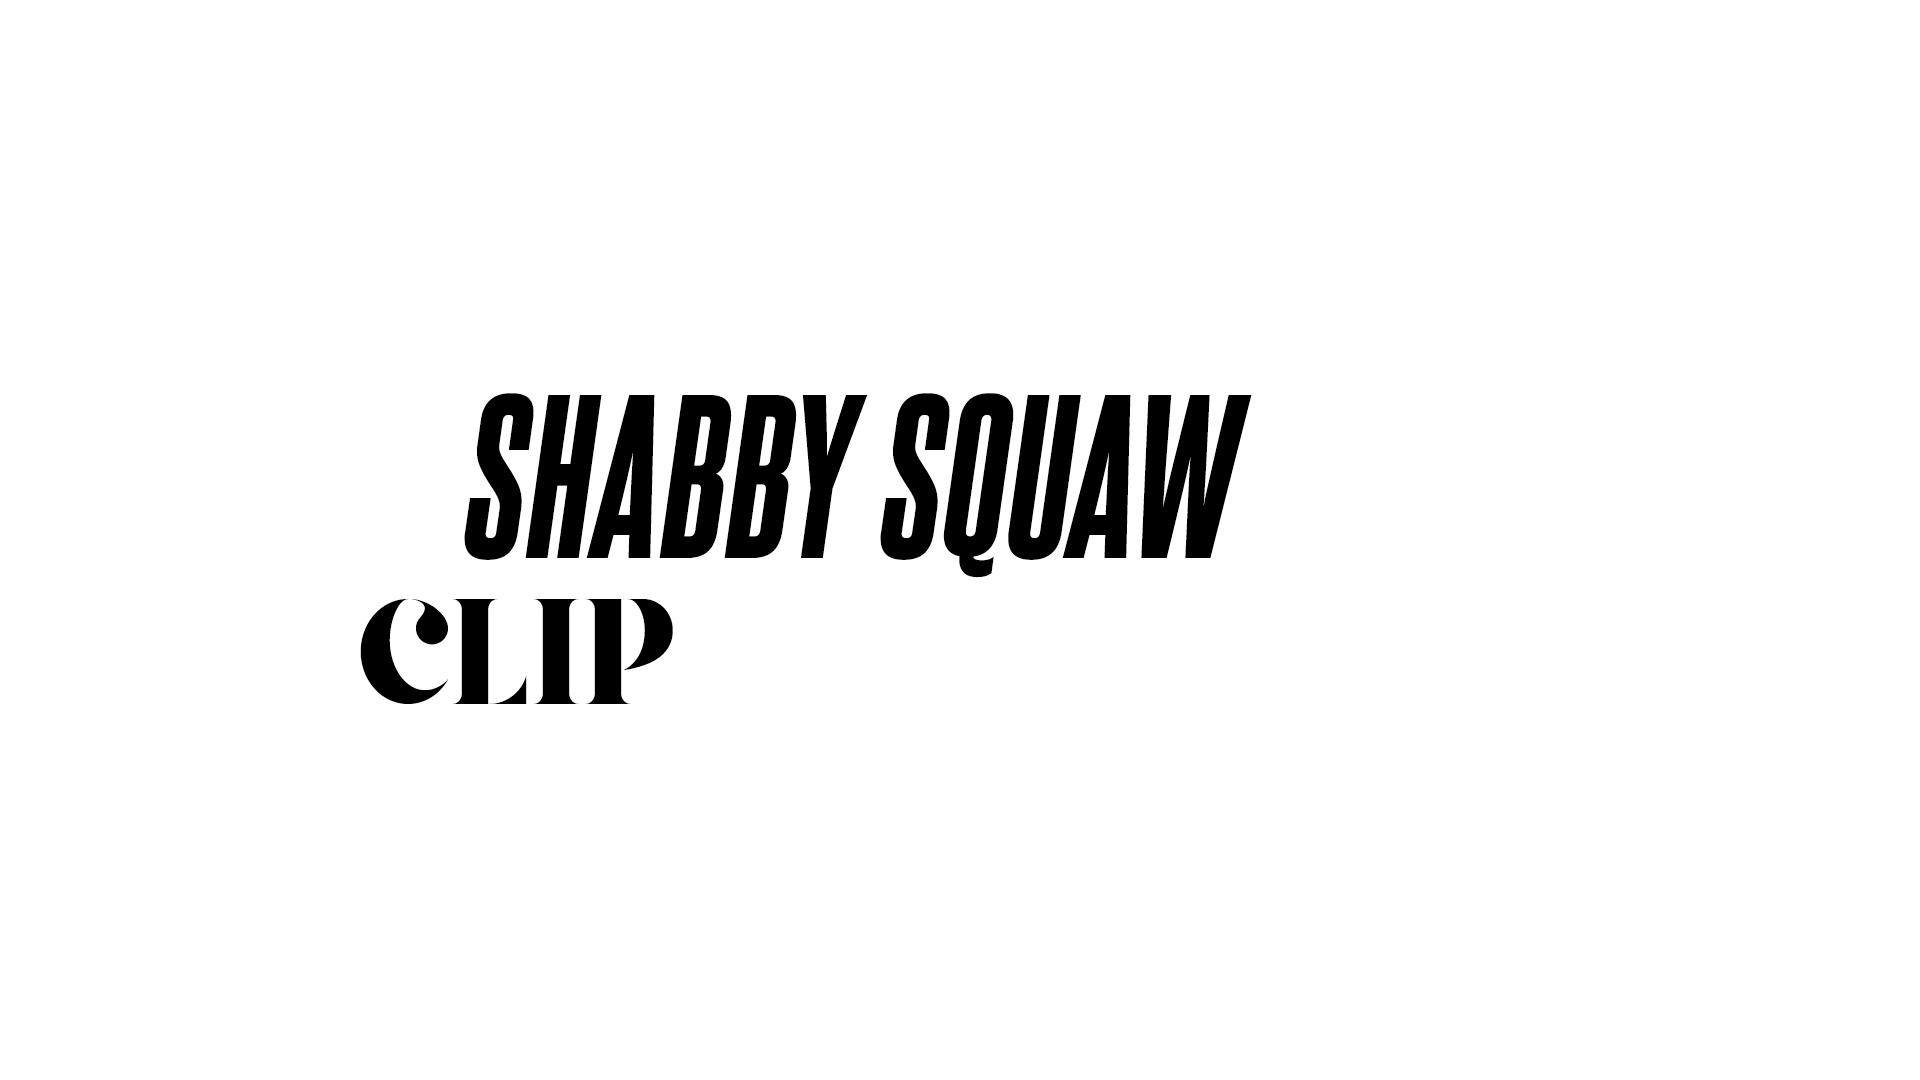 SHABBY SQUAW - CLIP